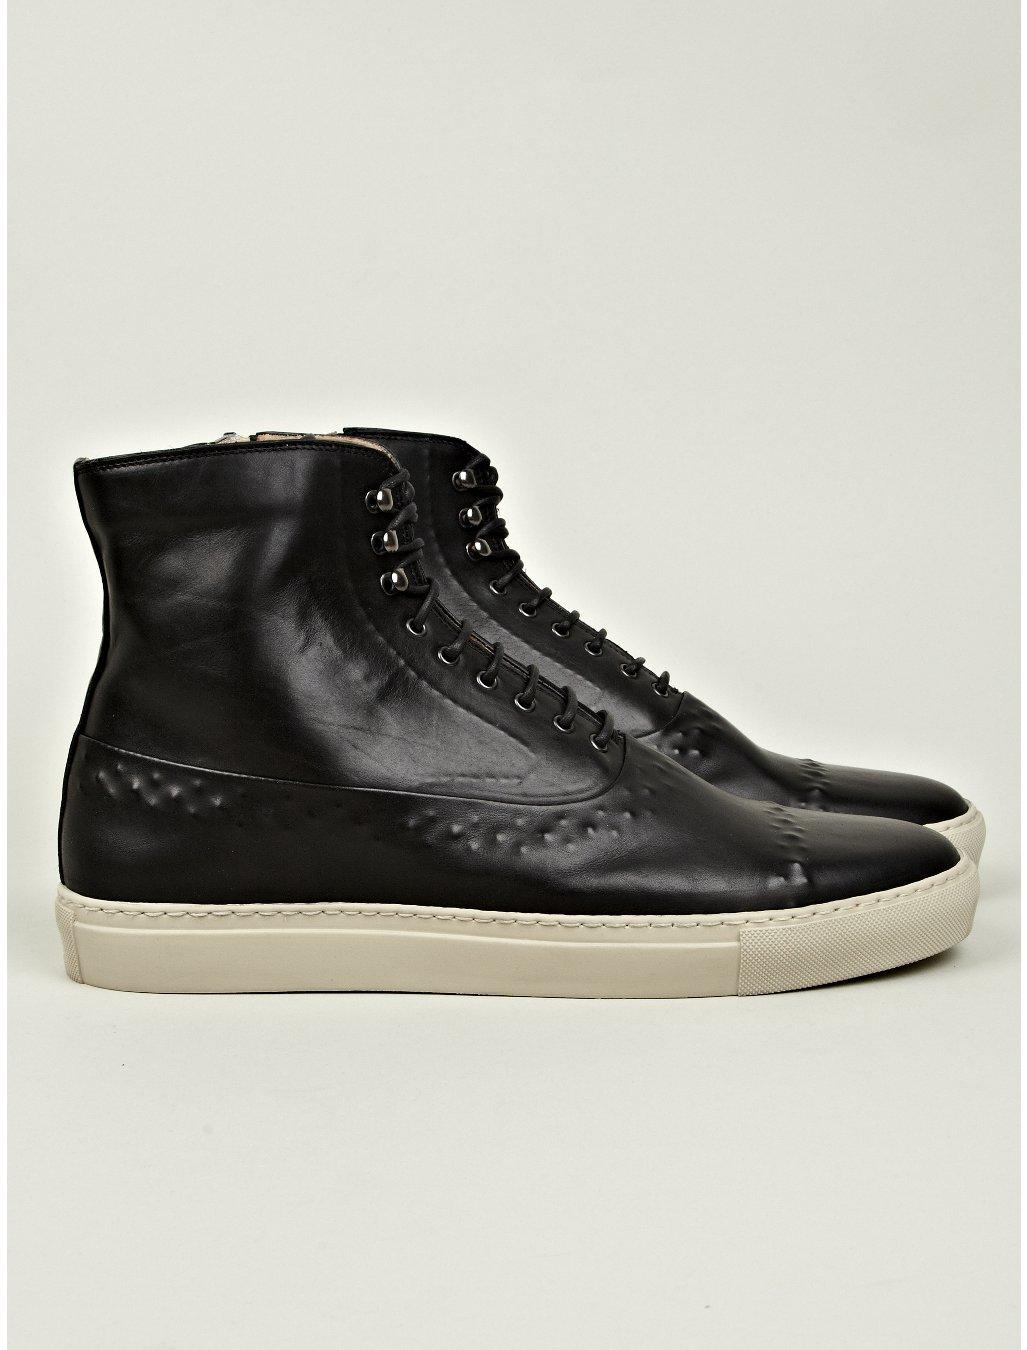 alexander mcqueen vacuum detail high top sneaker in black. Black Bedroom Furniture Sets. Home Design Ideas